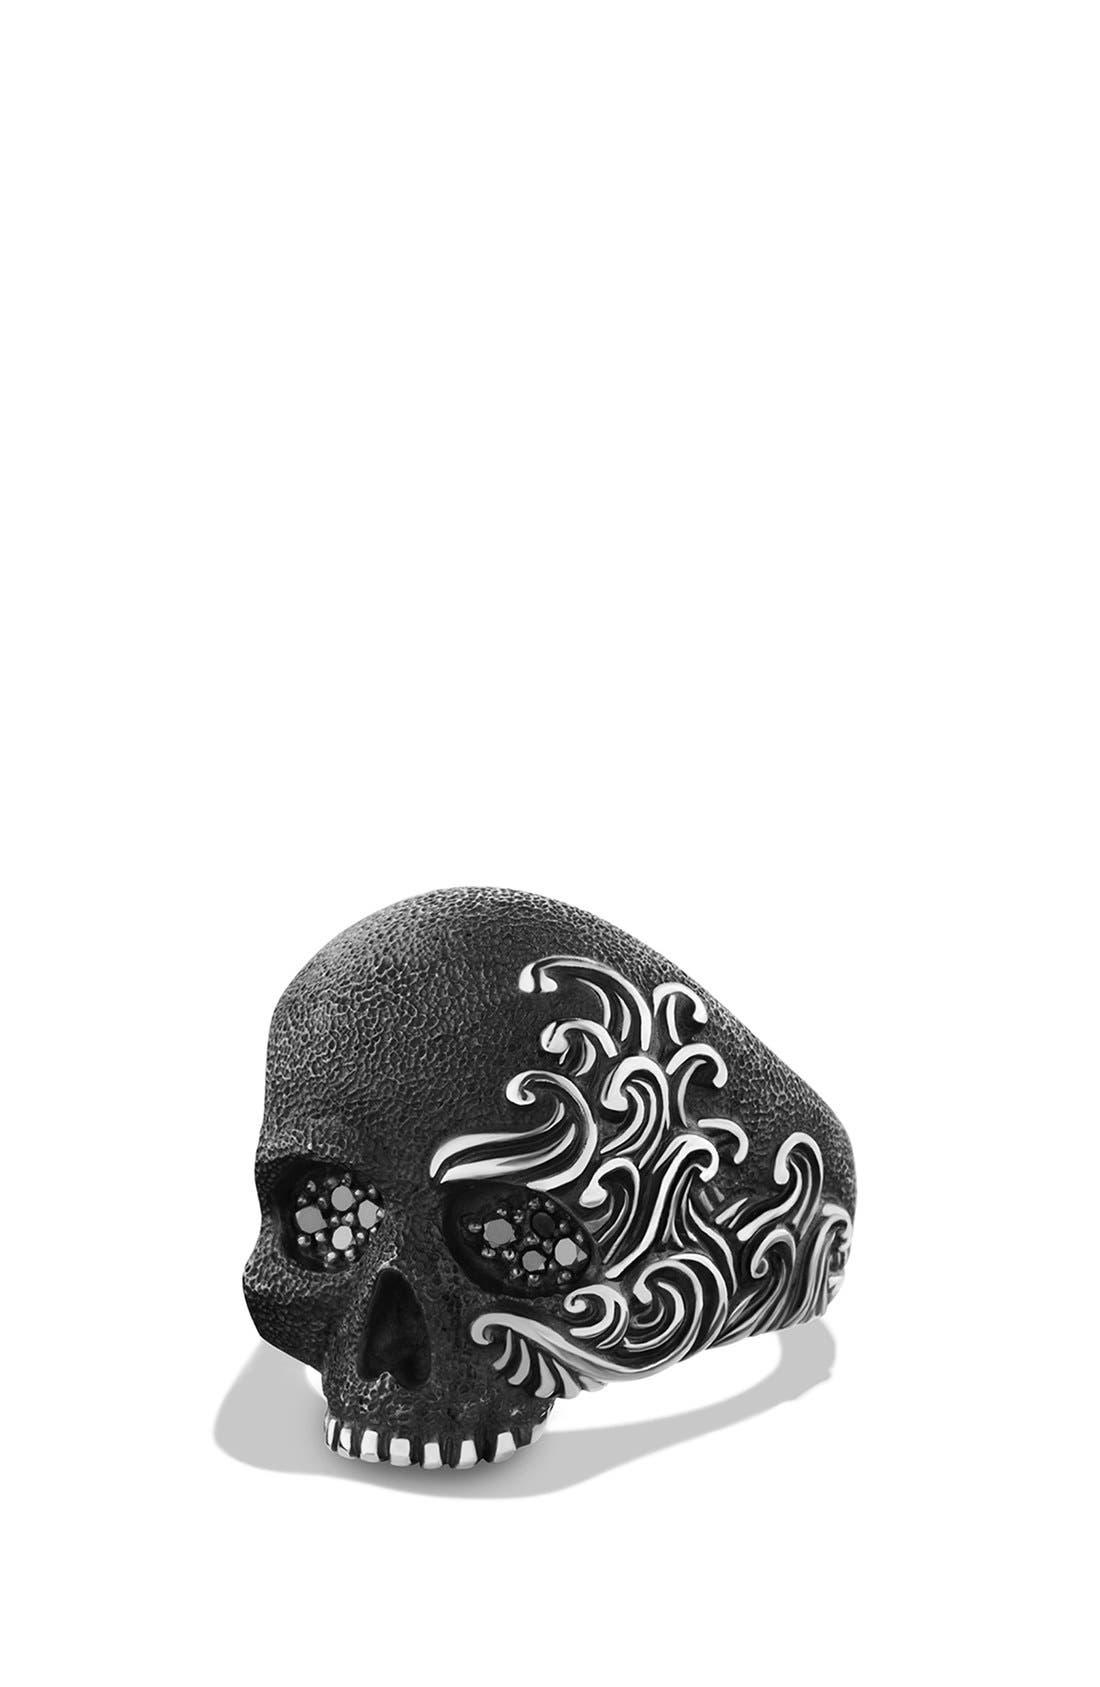 'Waves' Large Skull Ring with Black Diamonds,                         Main,                         color, BLACK DIAMOND